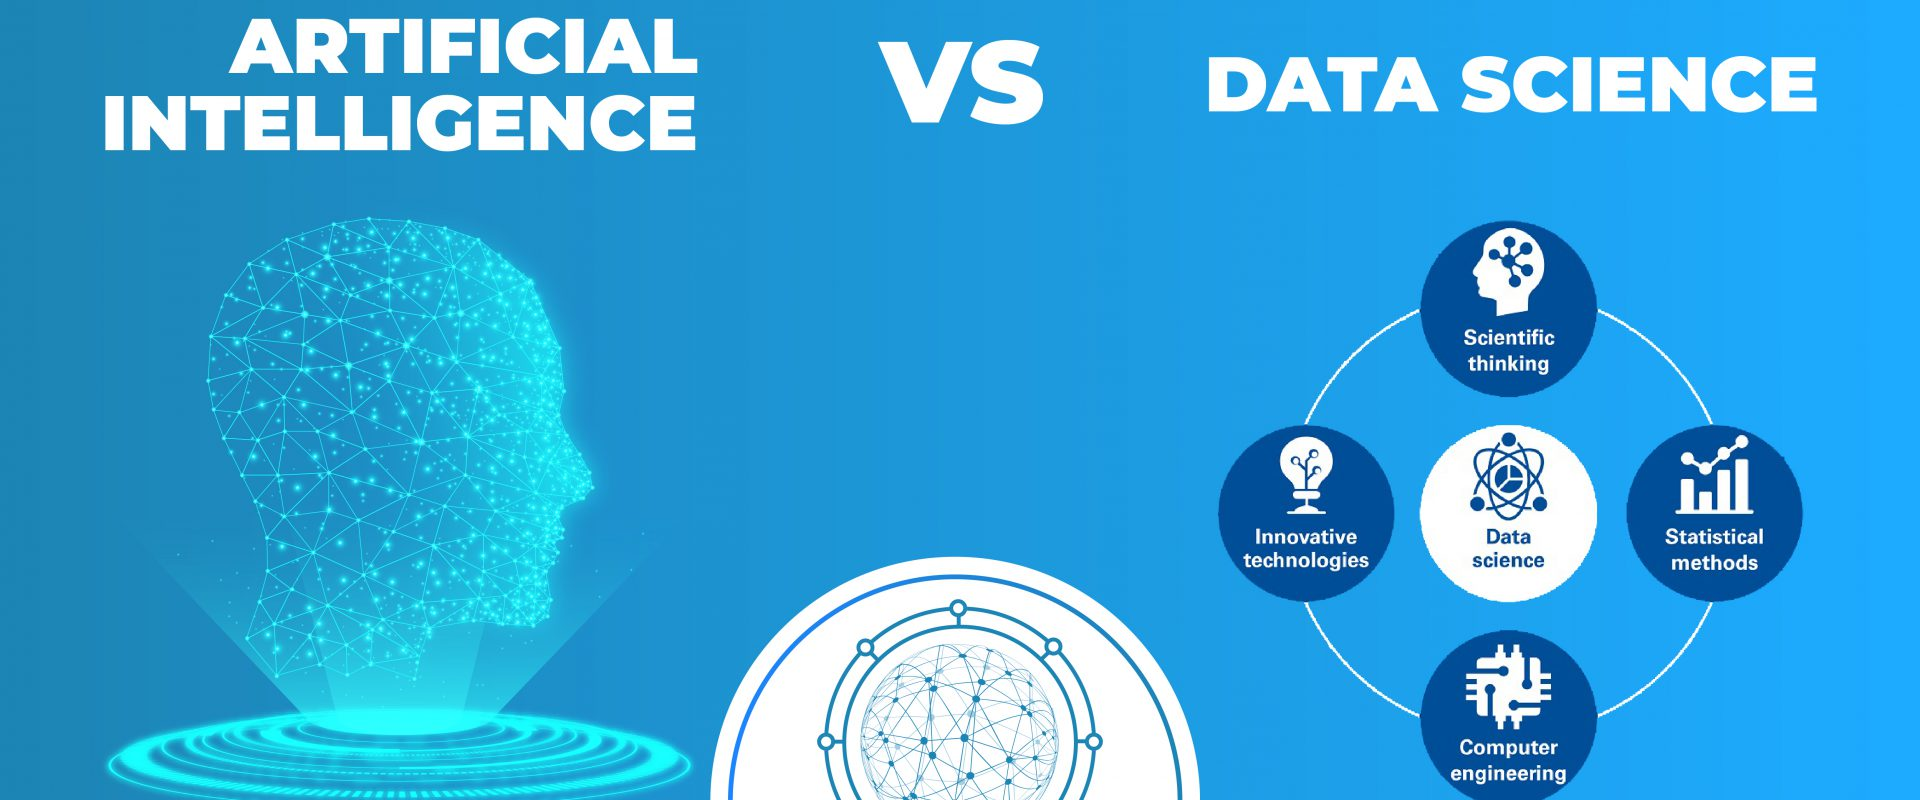 Data Science VS Artificial Intelligence